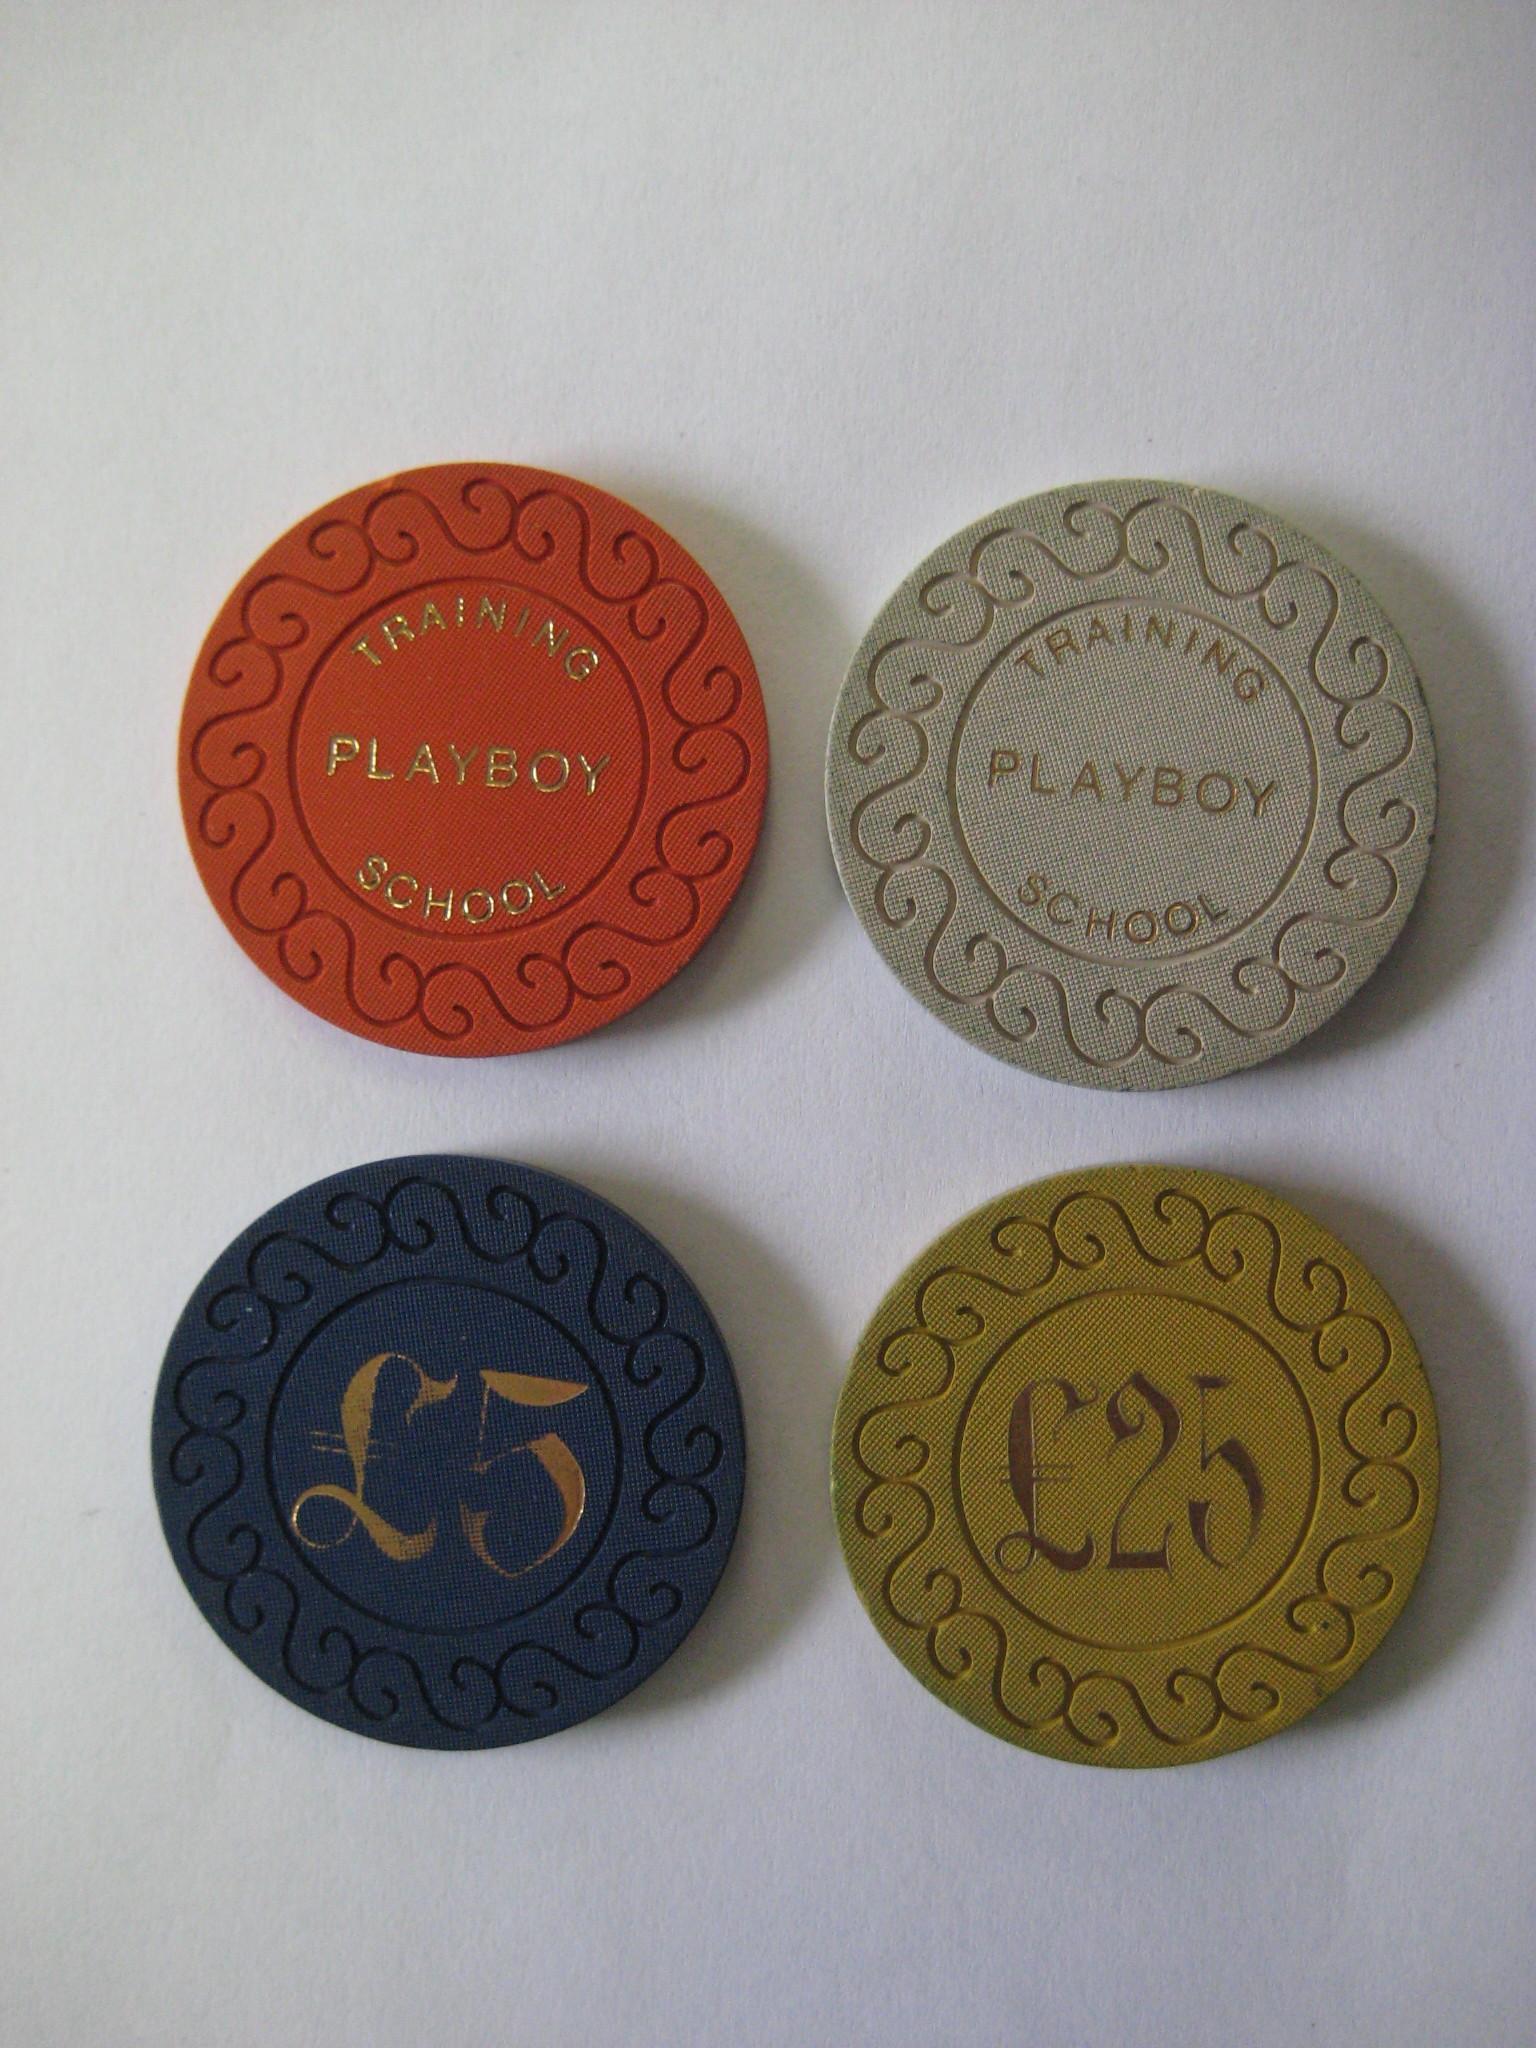 Playboy Training School Casino chips